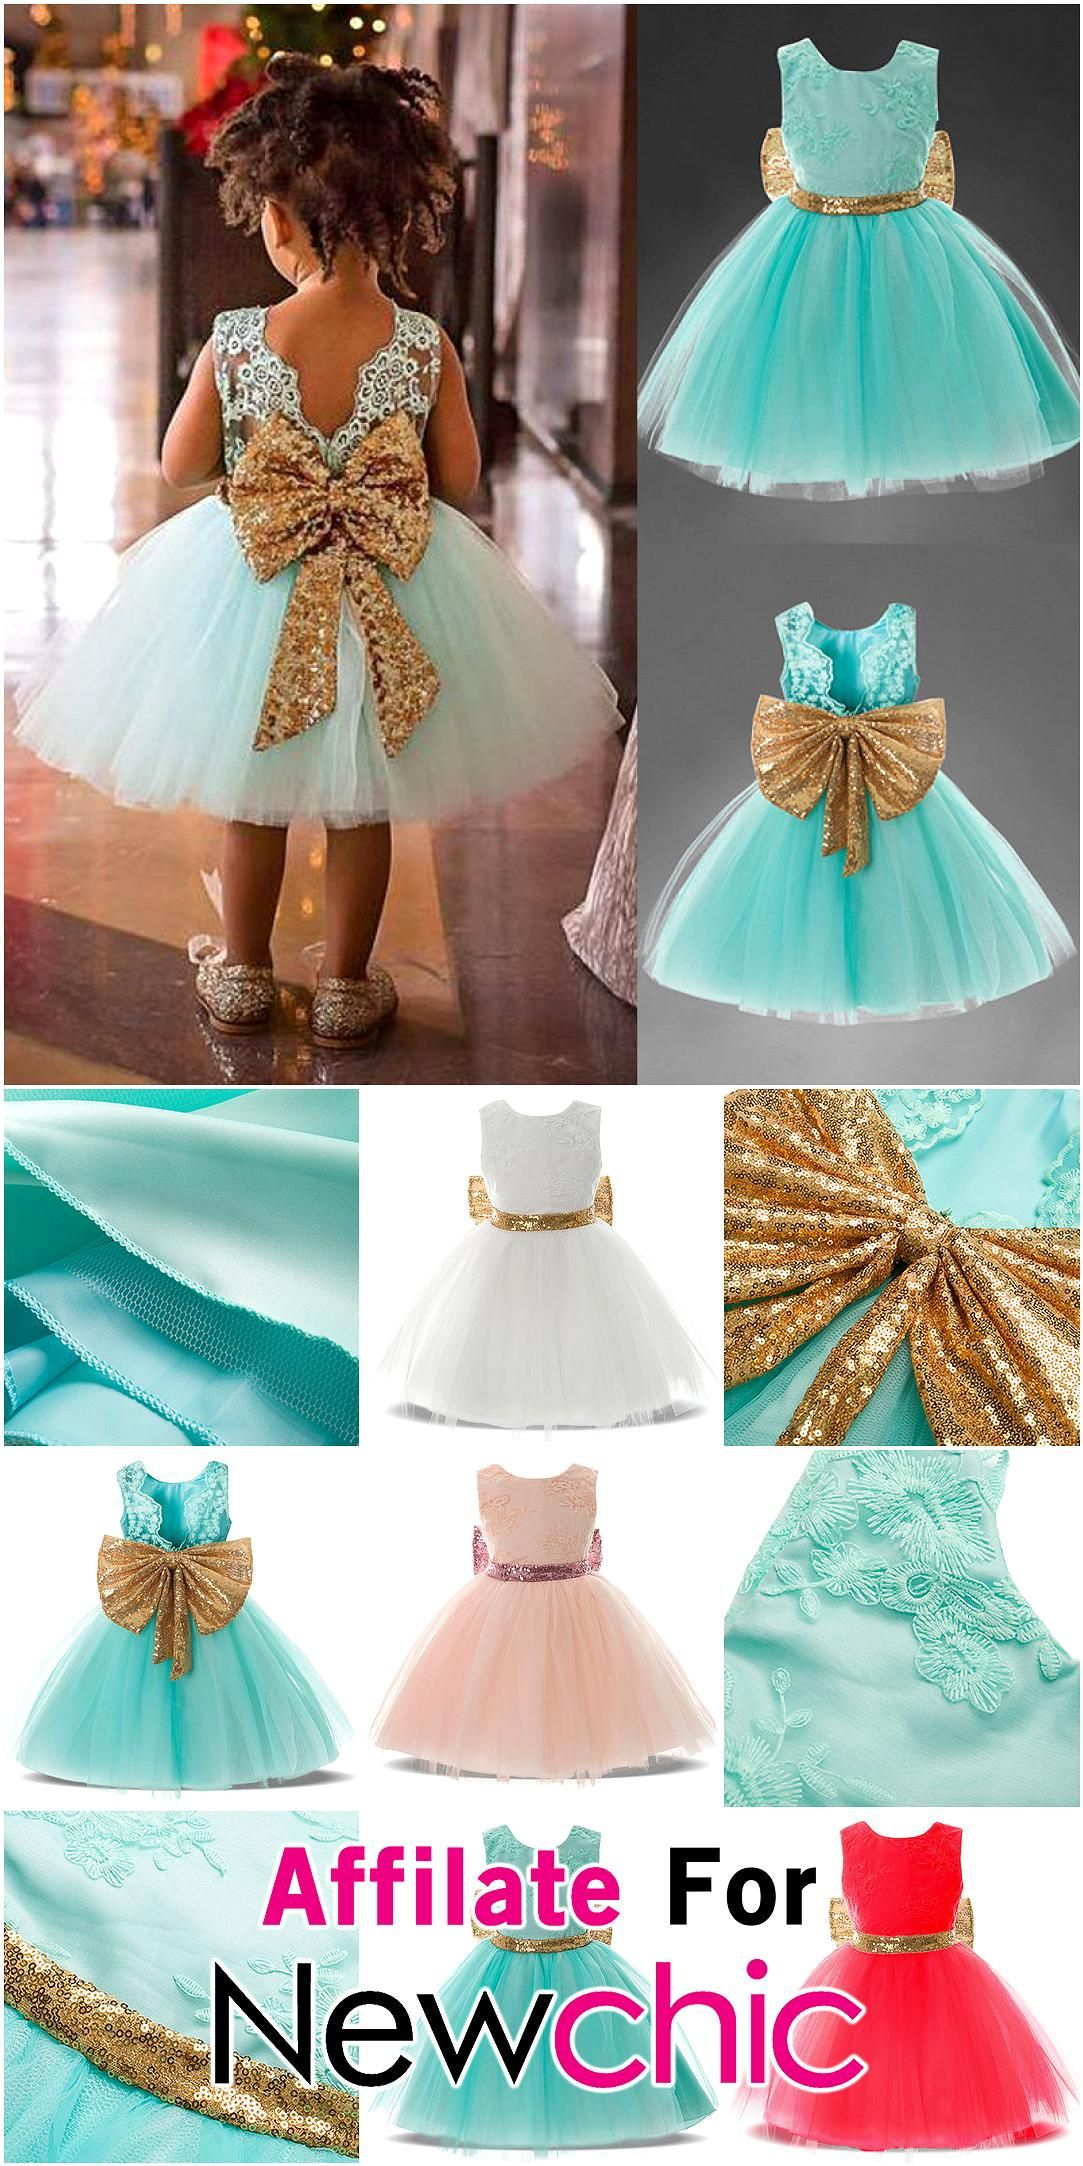 Big bowknot girls toddler birthday wedding princess dress